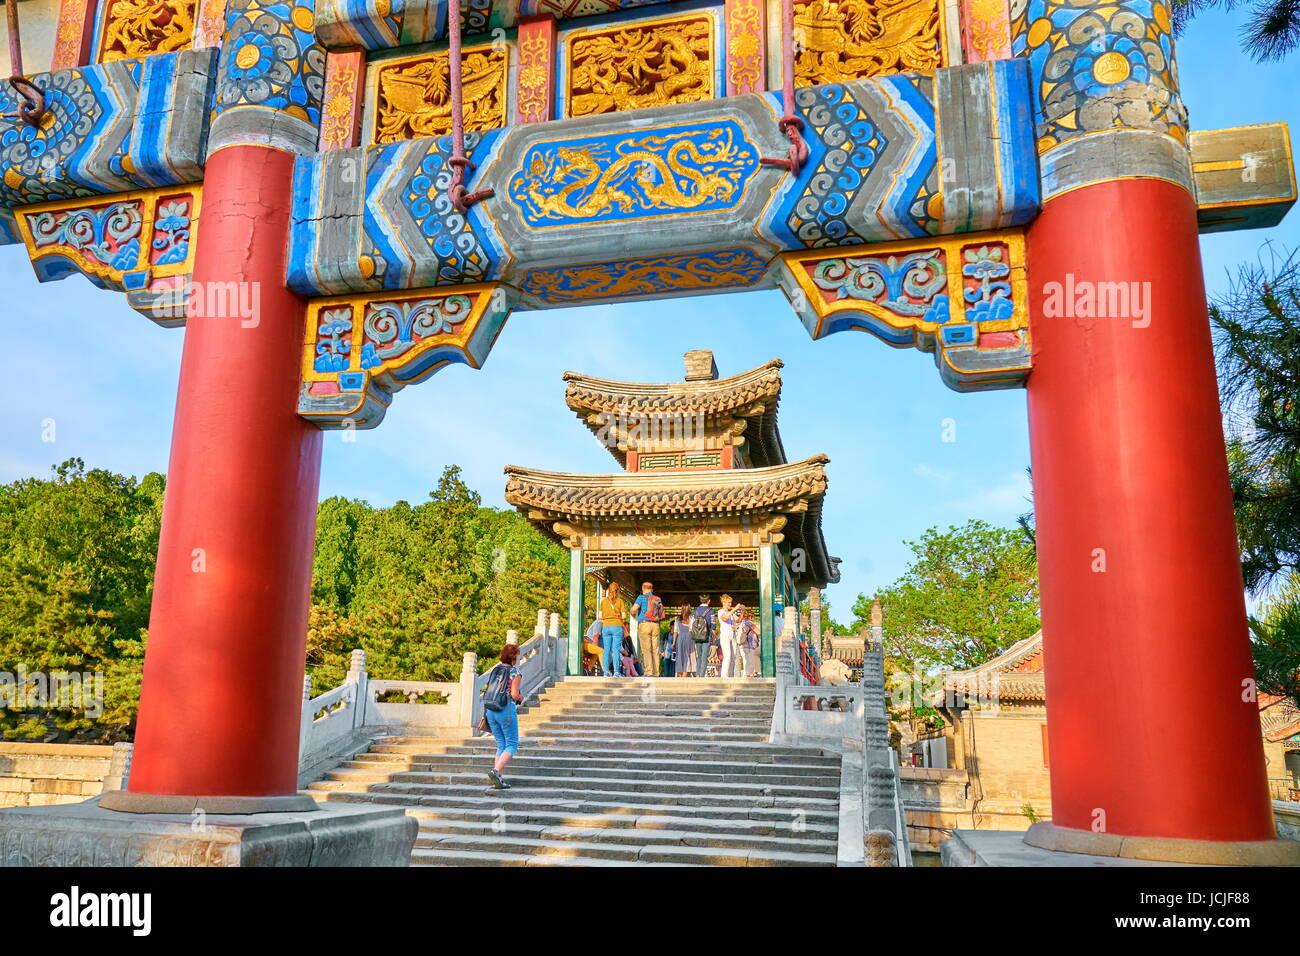 Pailou decorativa, Palacio de Verano, Beijing, China Imagen De Stock